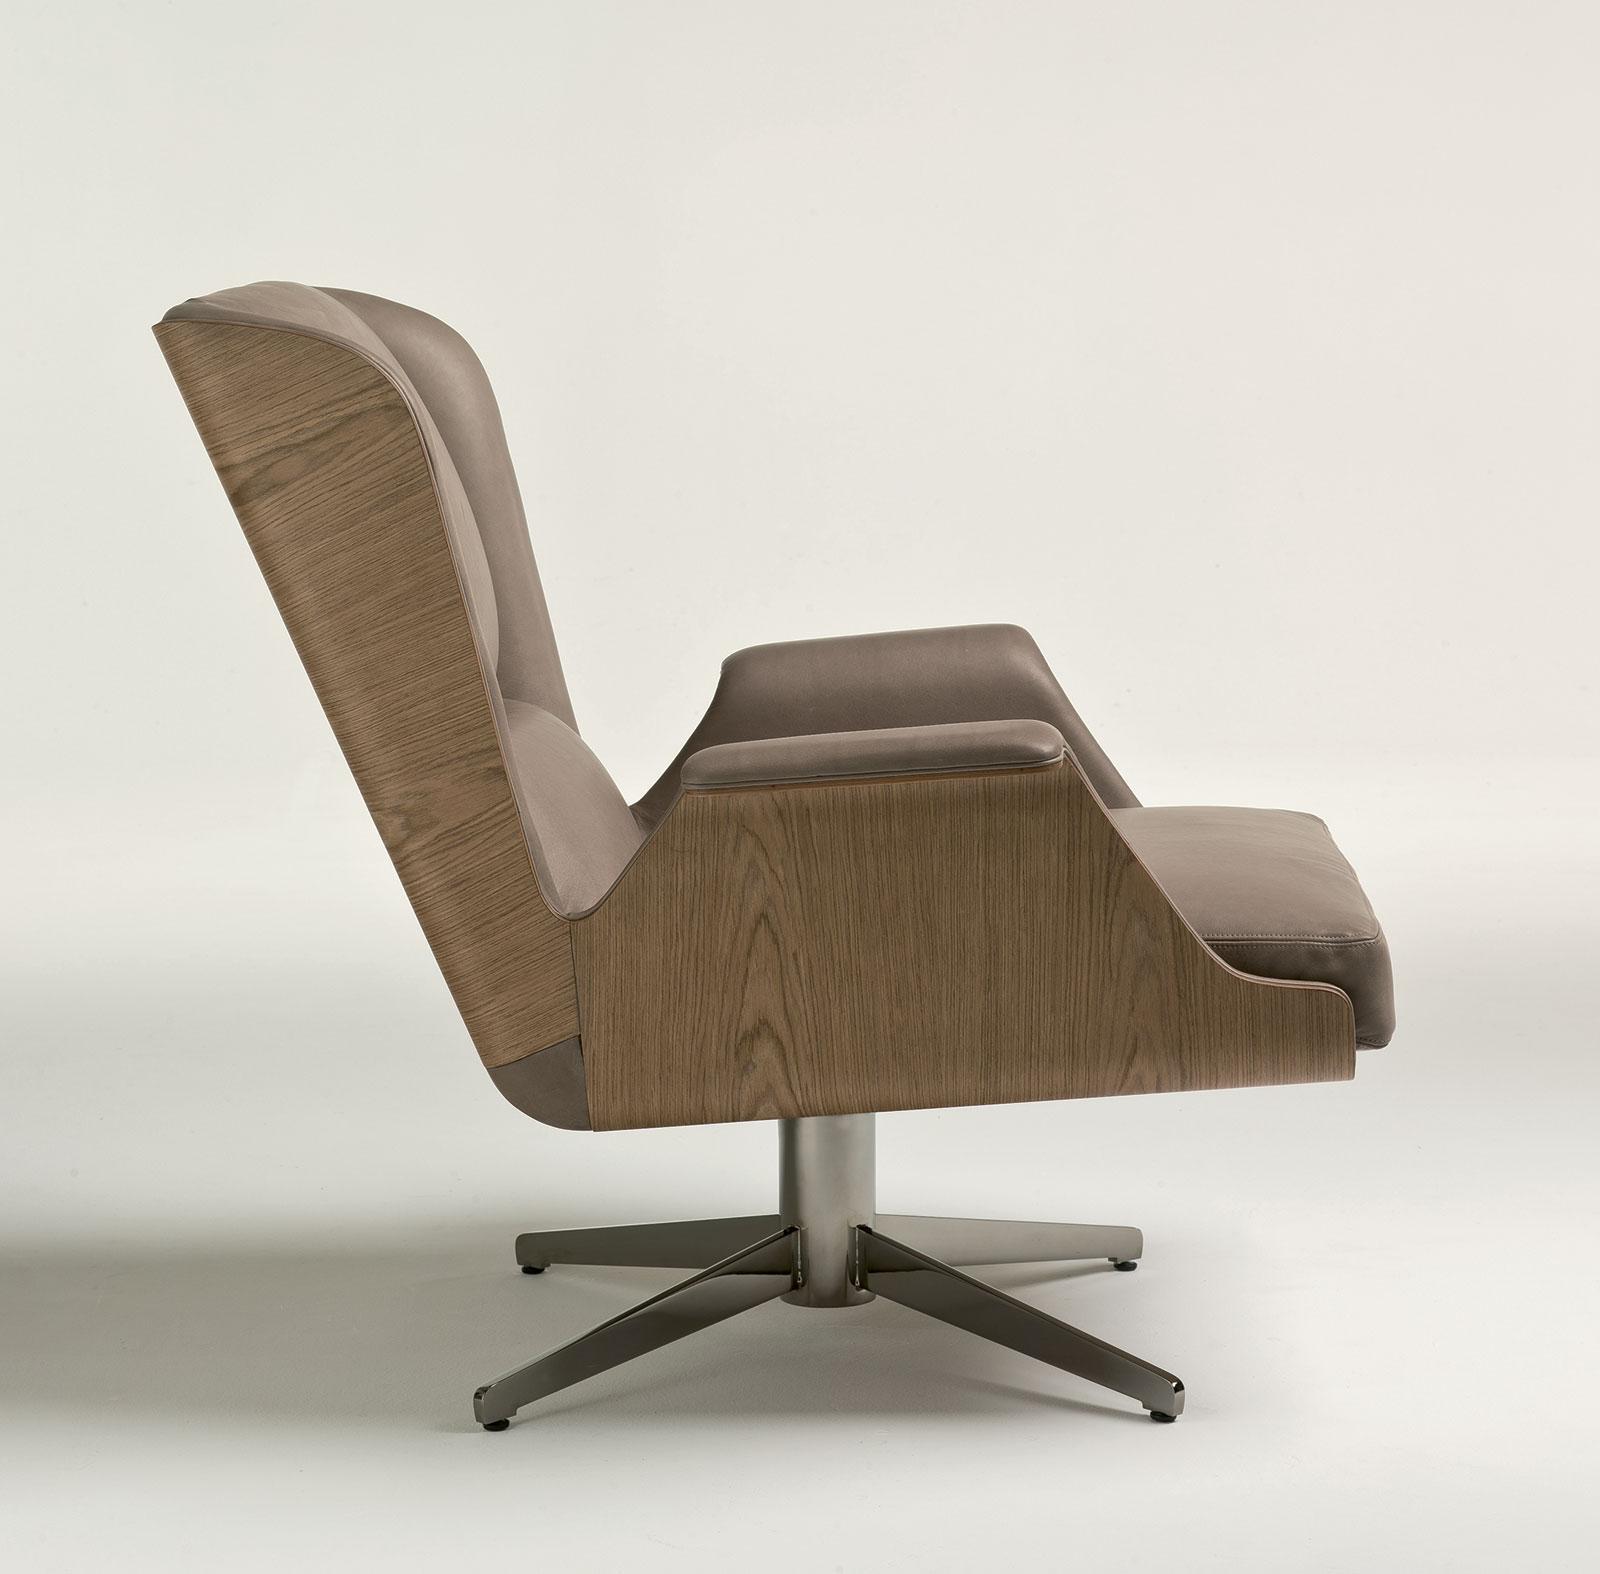 garbo fauteuil relax cuir vente en ligne italy dream design. Black Bedroom Furniture Sets. Home Design Ideas